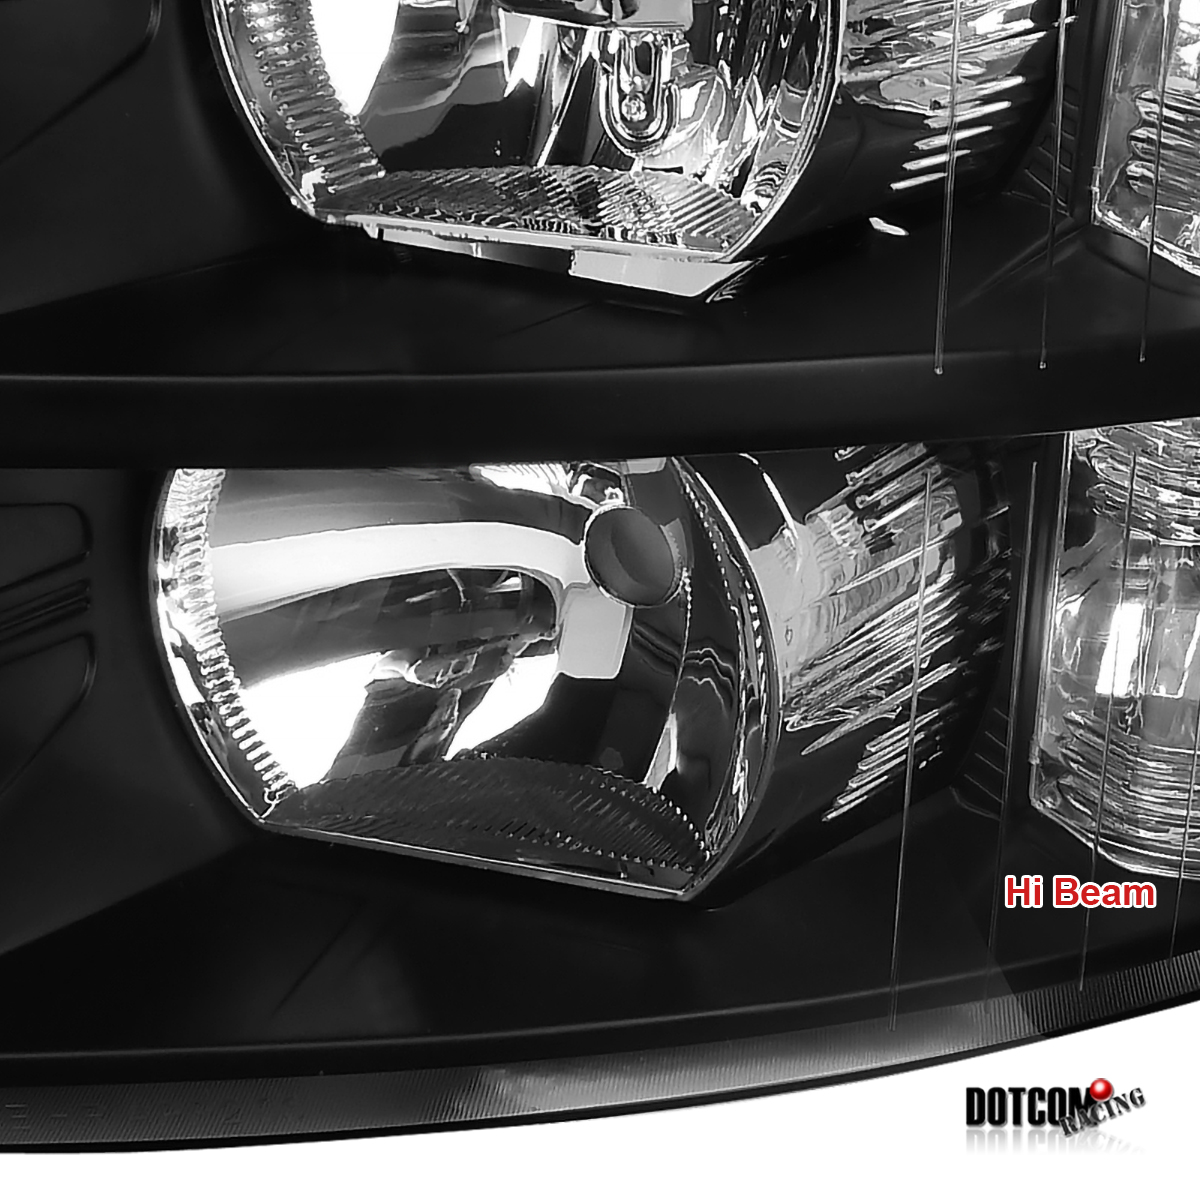 2004 Chevy Silverado 2500HD Duramax Diesel additionally 2005 Chevy Silverado 2500HD likewise 2000 Chevy Silverado 2500HD Custom besides 2003 Honda CR V Fuse Box Diagram likewise 2008 Chevy Silverado Black Euro Headlights. on 2013 chevy silverado 2500hd